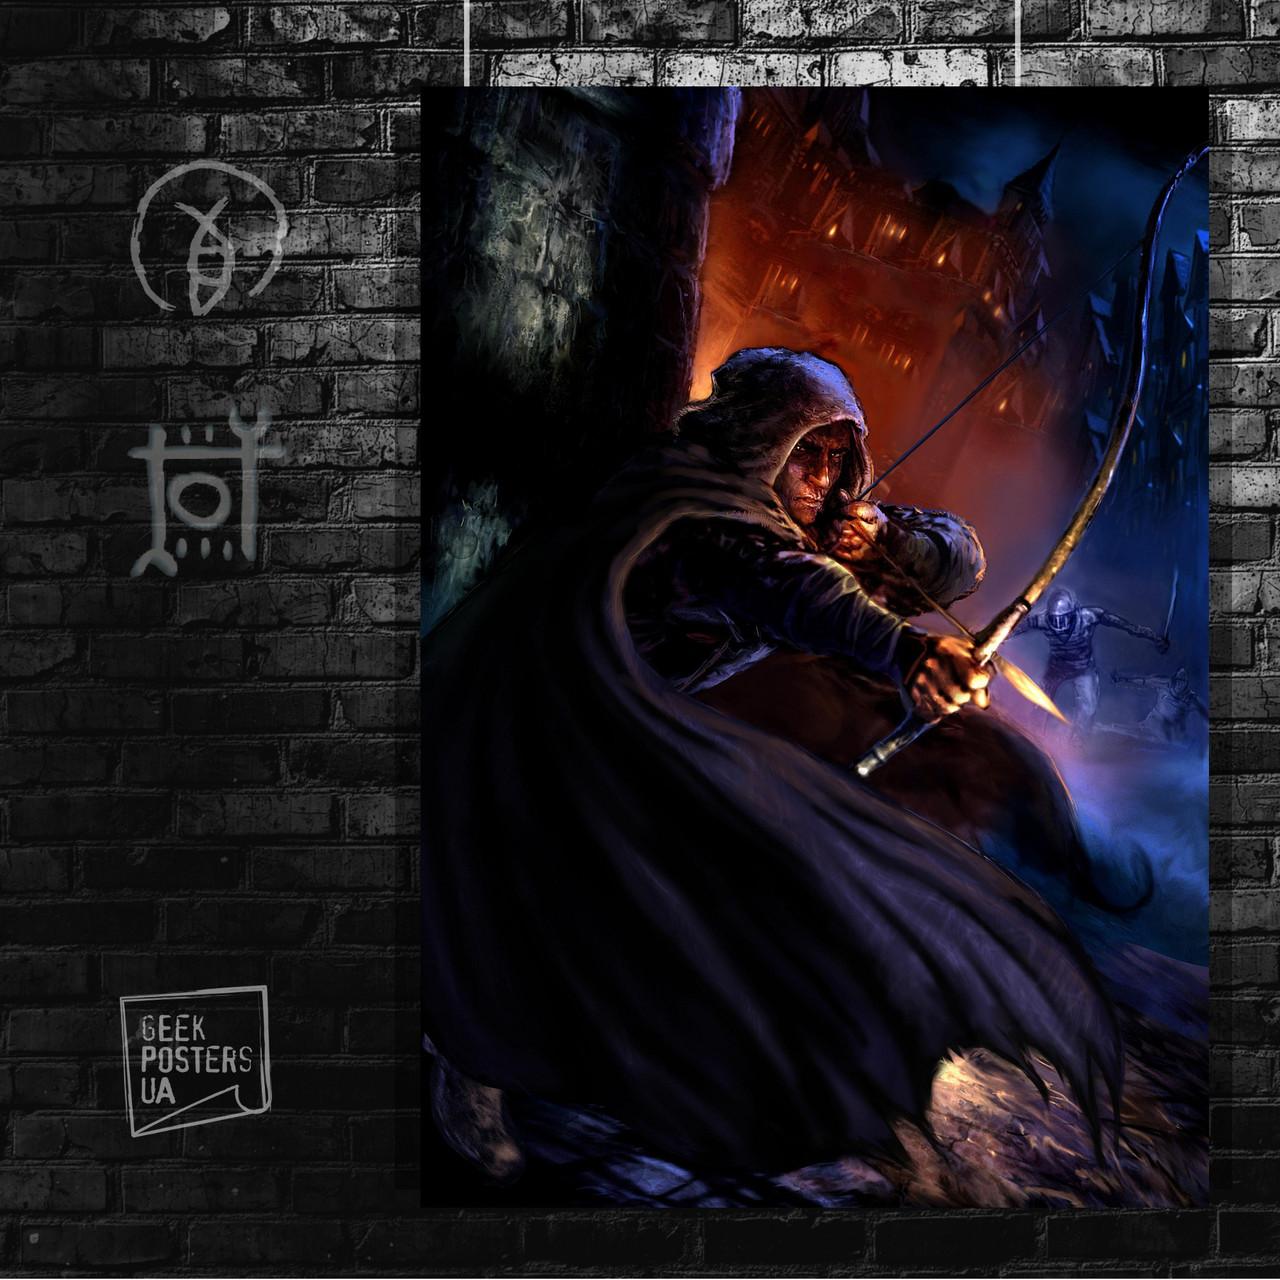 Постер Thief: The Dark Project, Вор: Тёмный Проект. Размер 60x42см (A2). Глянцевая бумага